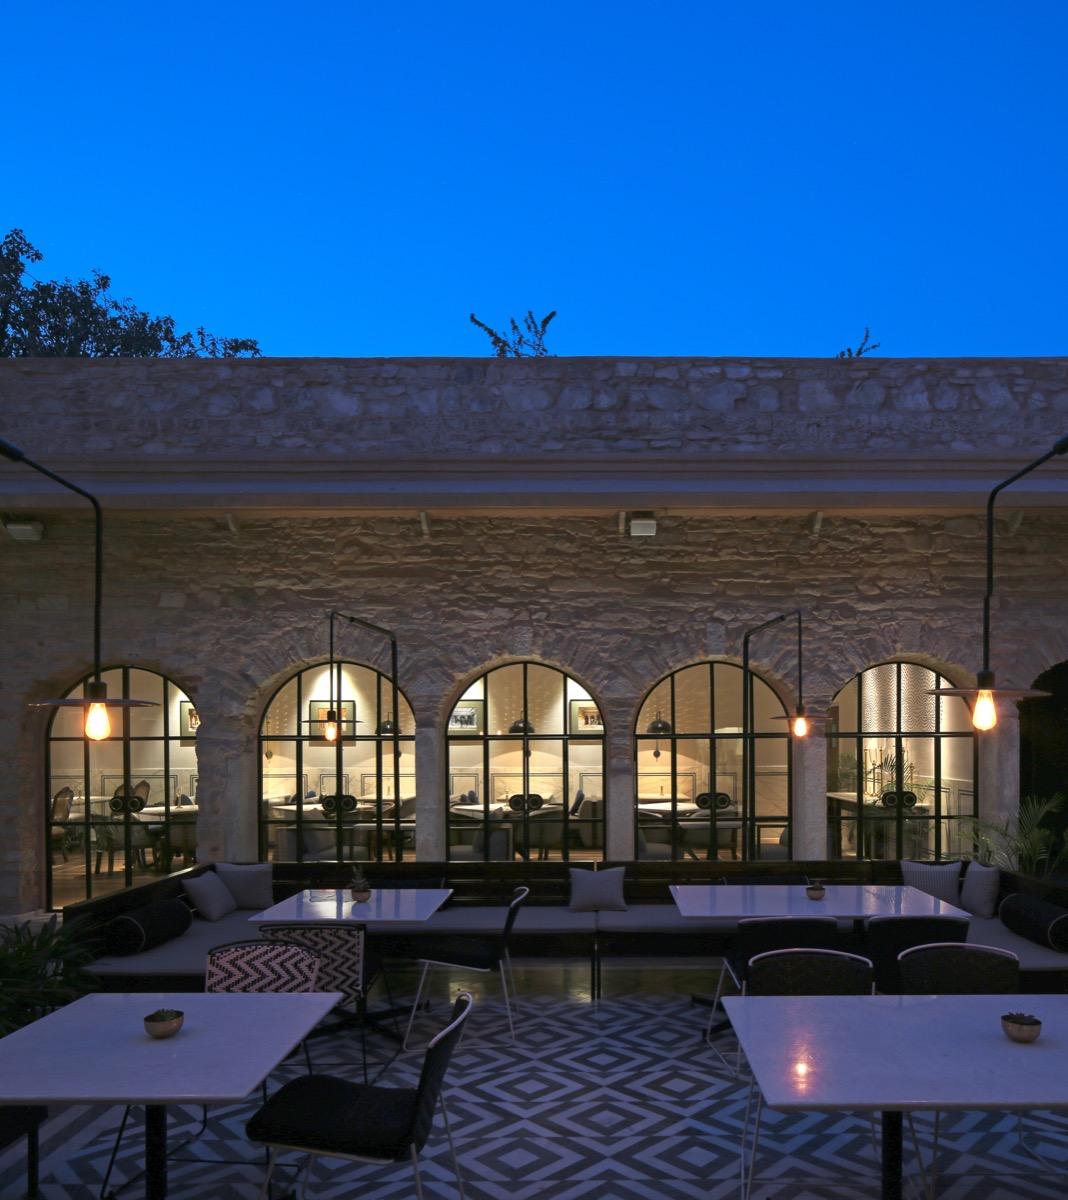 Baradari at City Palace Jaipur, by Studio Lotus